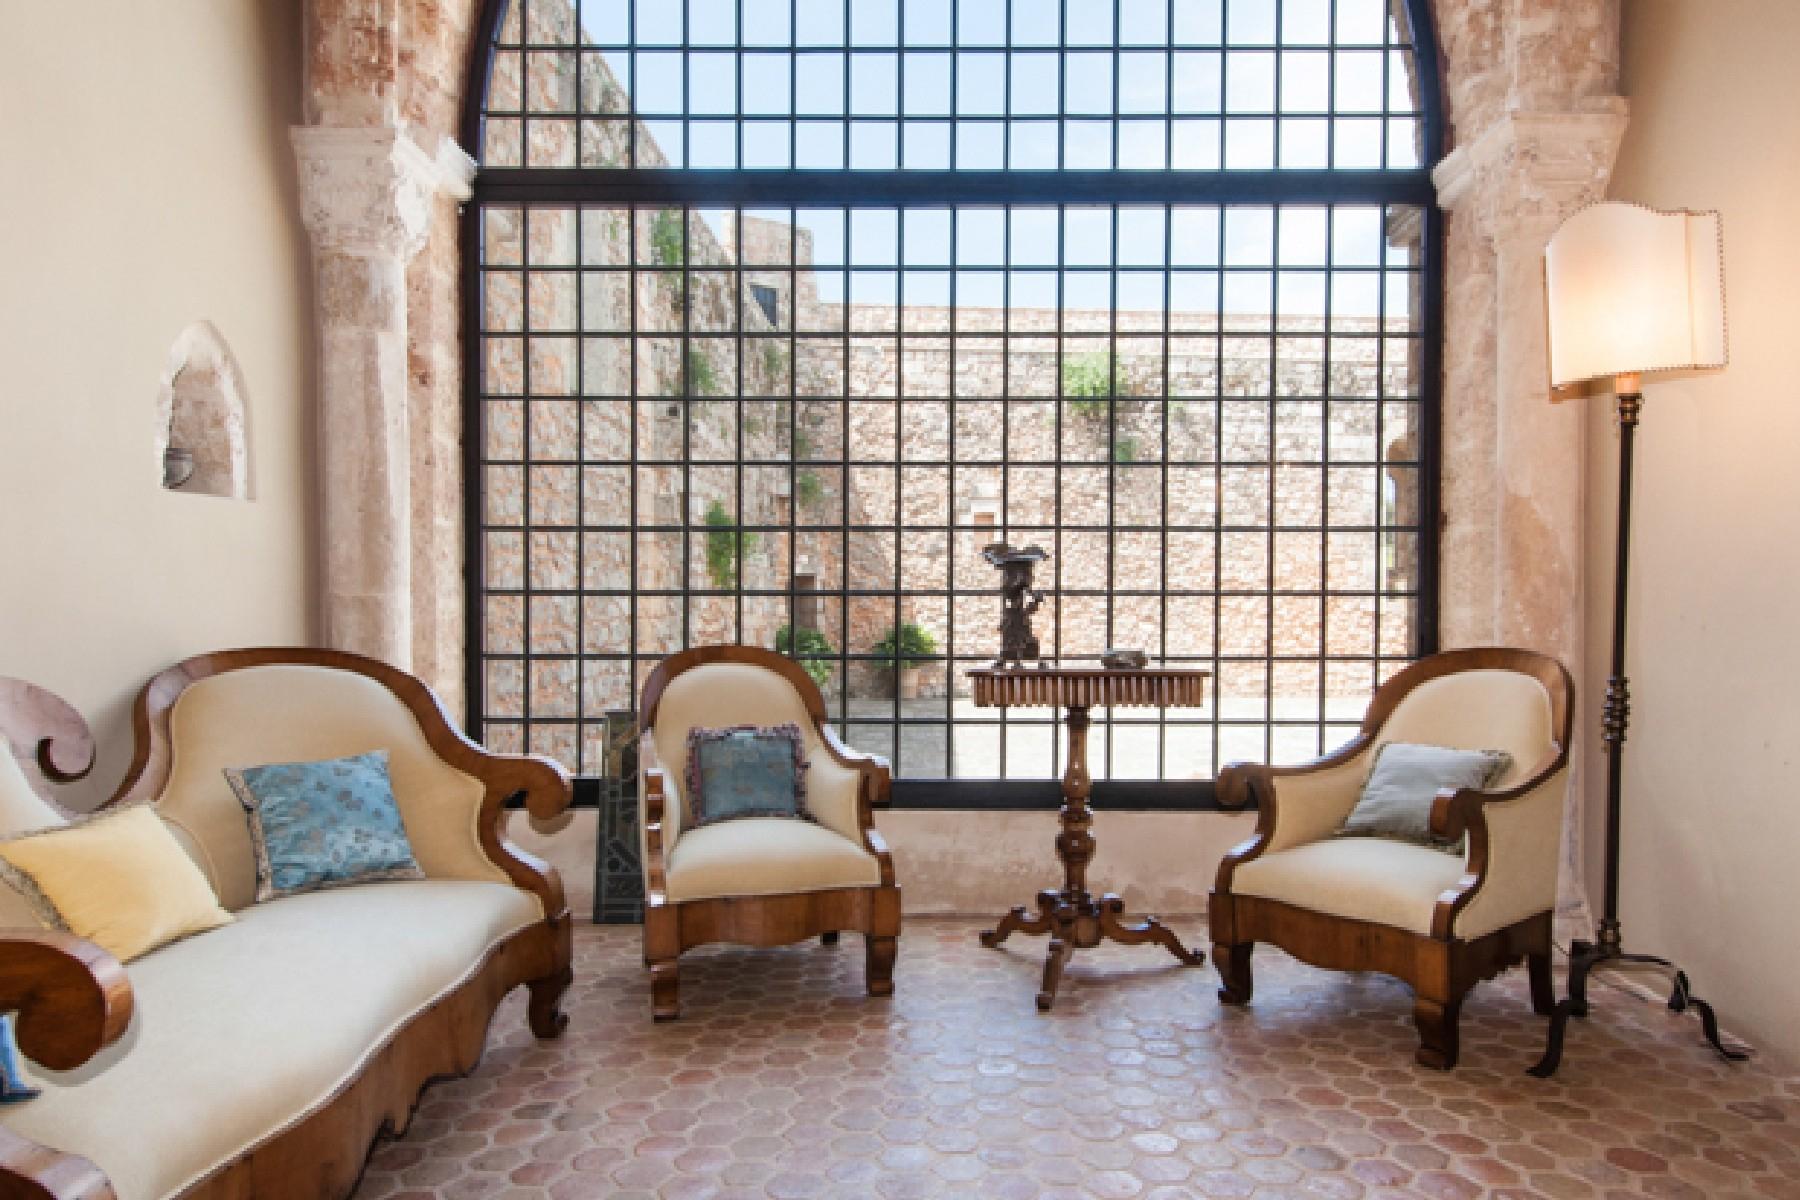 Villa in Vendita a Tricase: 5 locali, 1700 mq - Foto 21